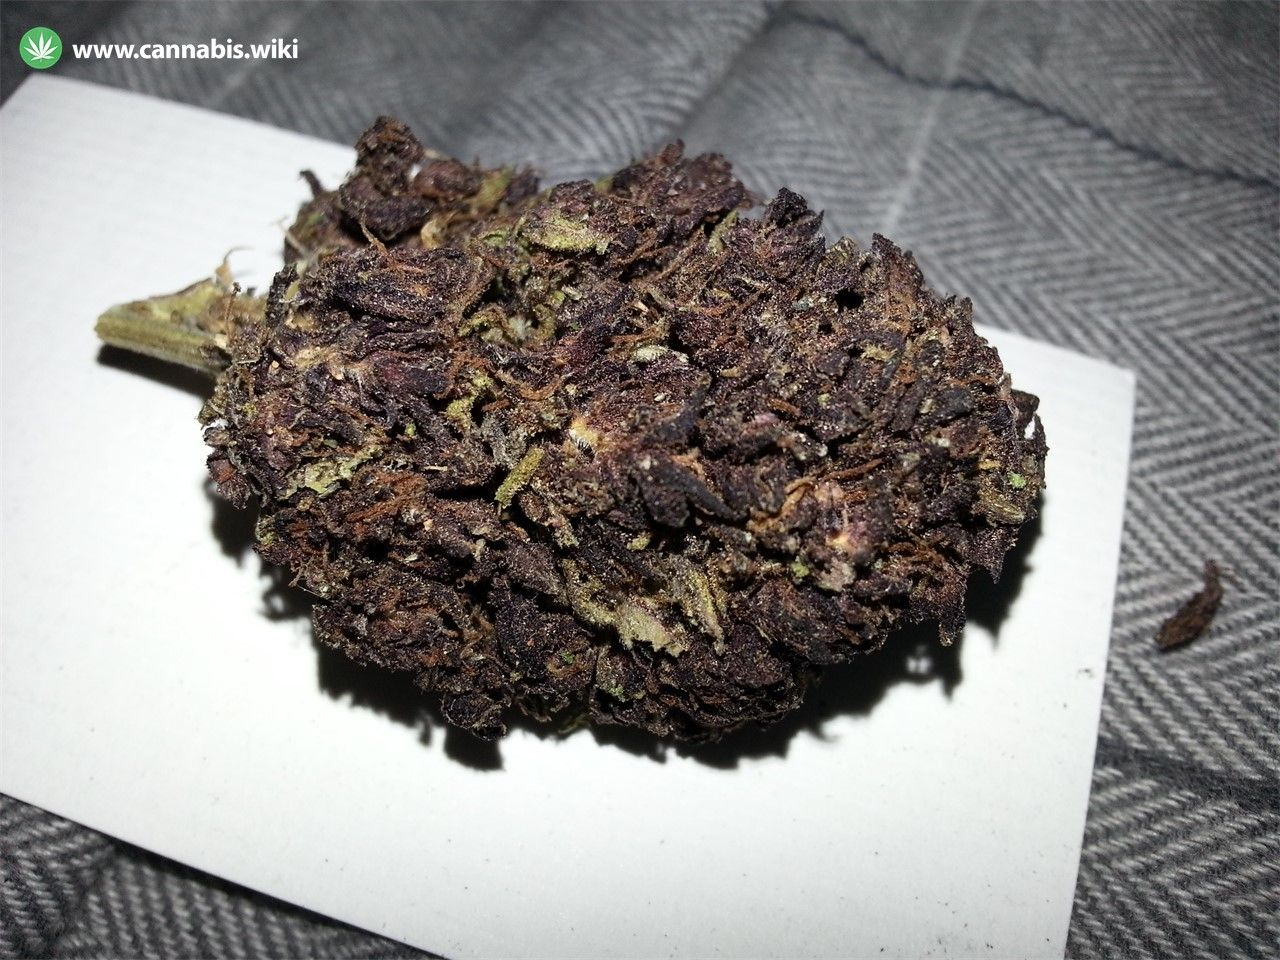 Cannabis Wiki - Strain Black Label Kush - Bck - Indica